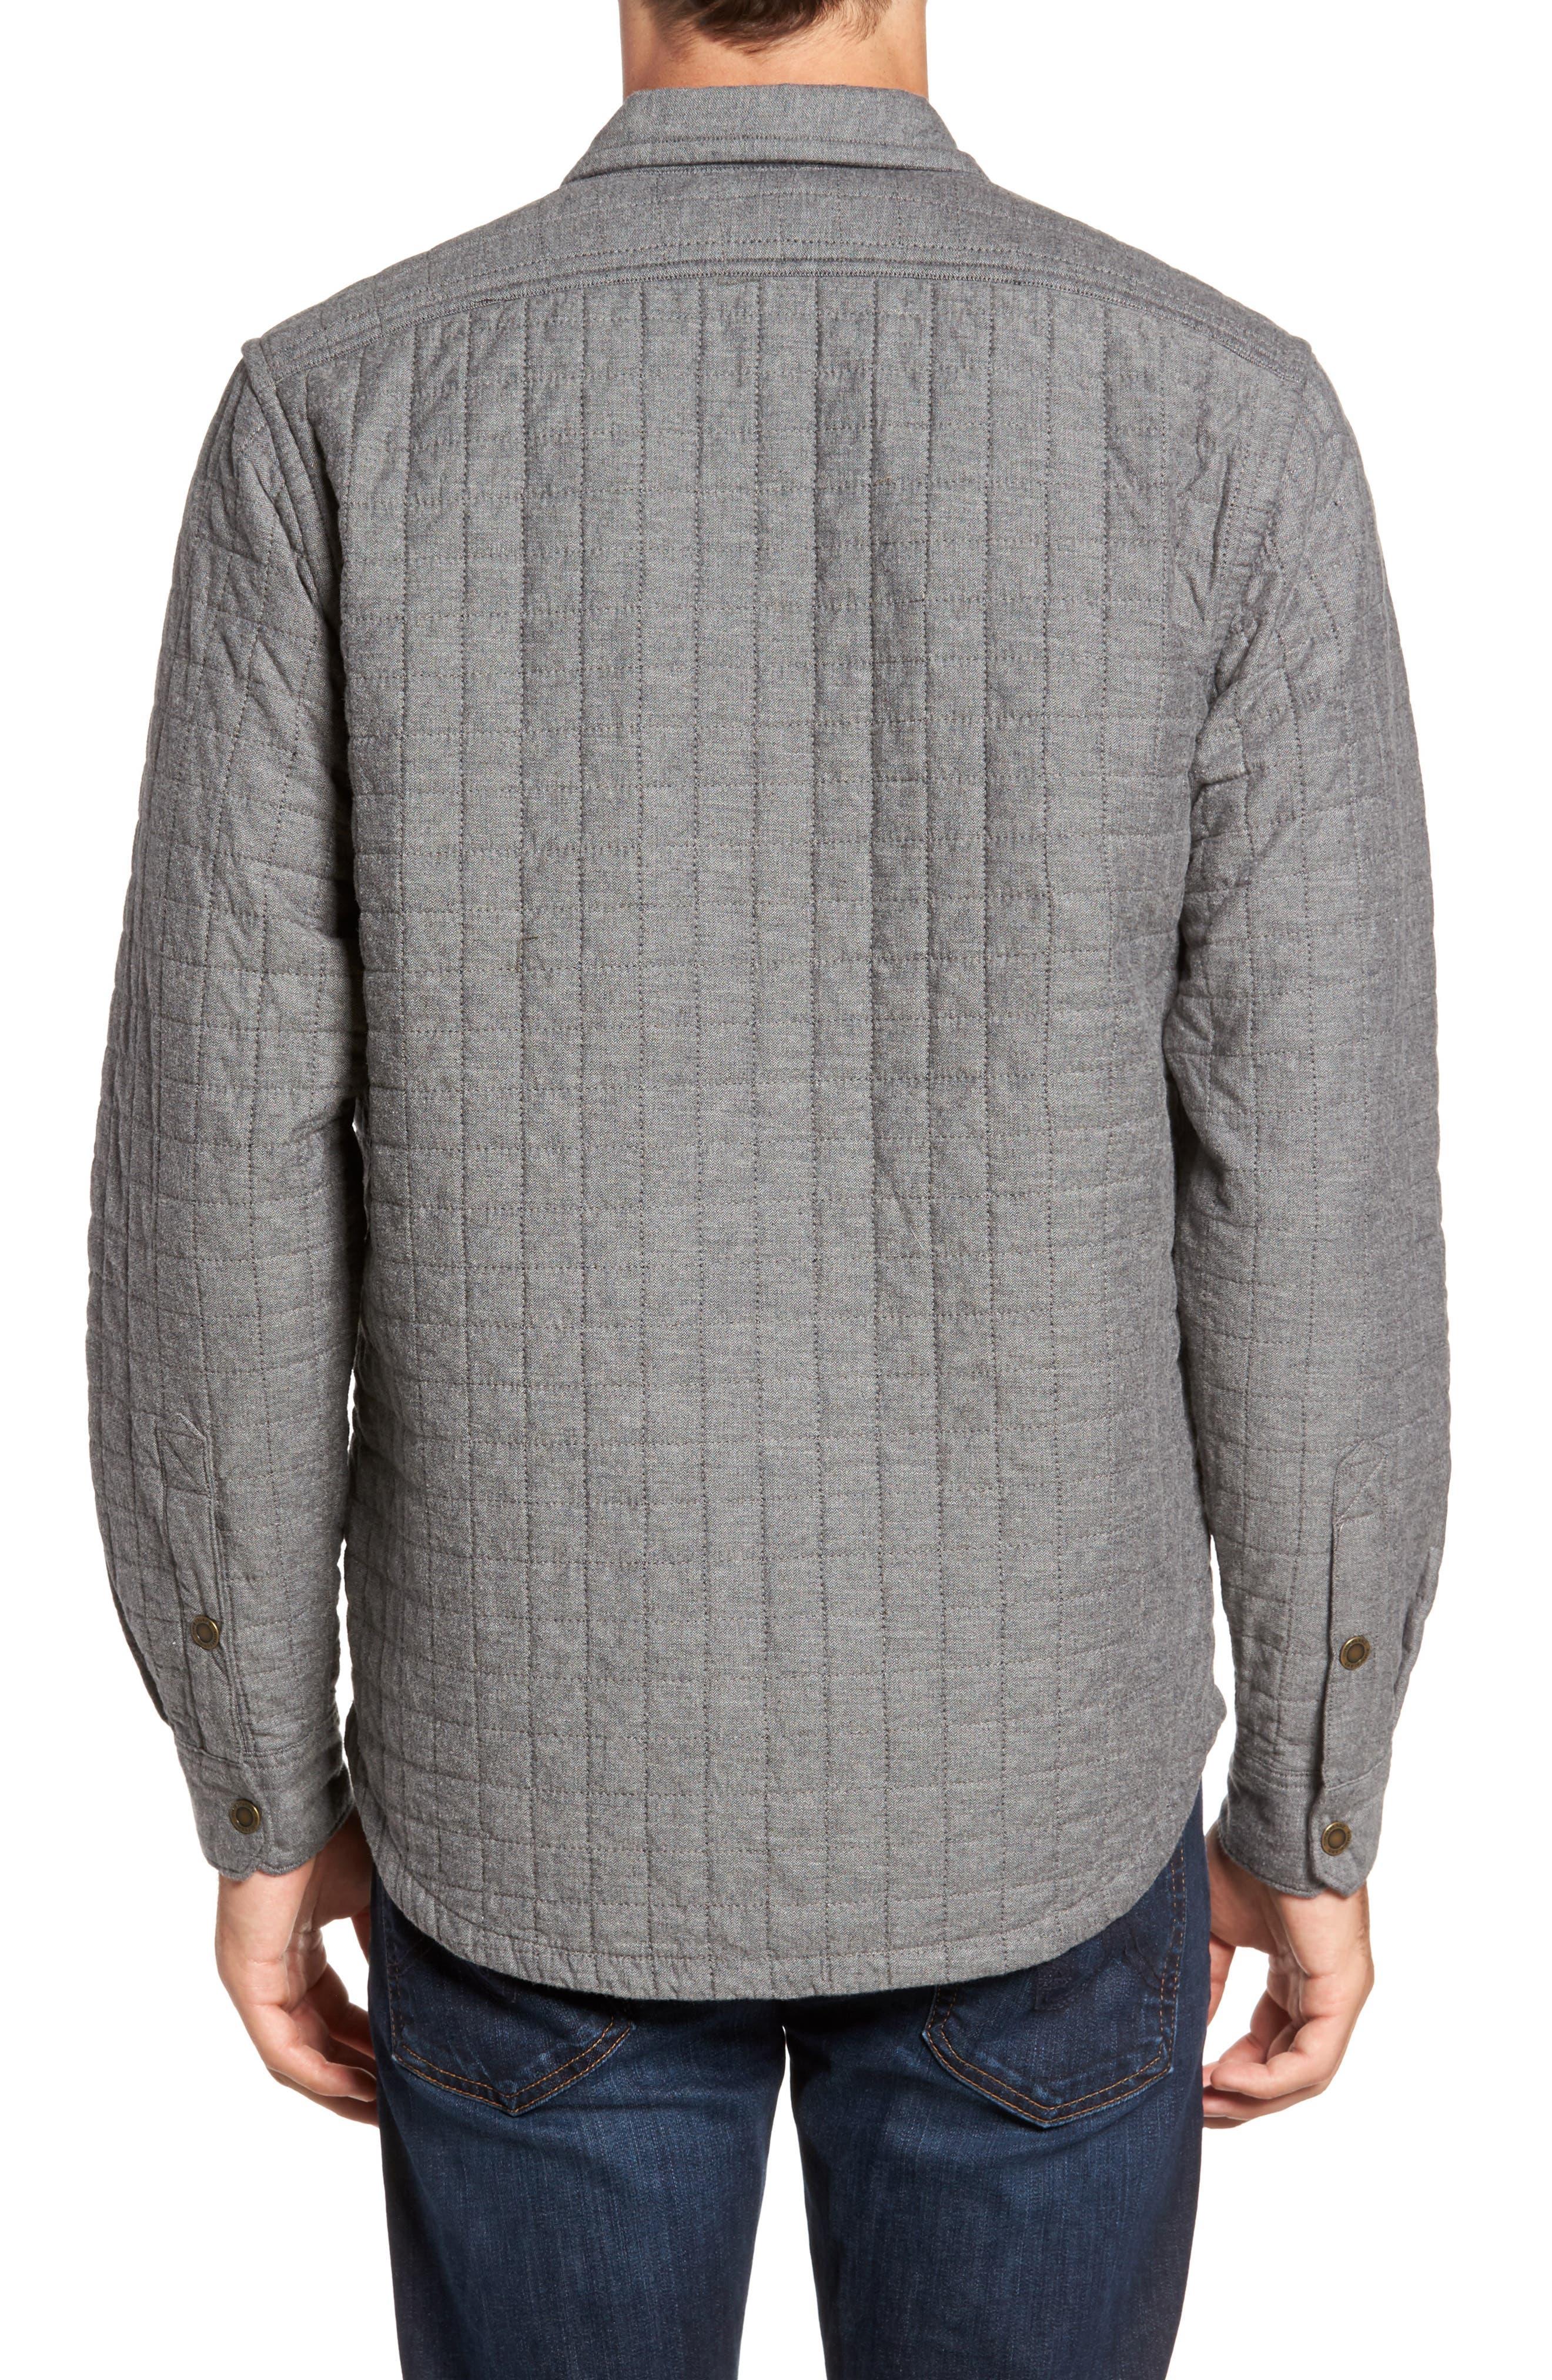 Alternate Image 2  - Timberland Gunstock River Lightweight Quilted Shirt Jacket